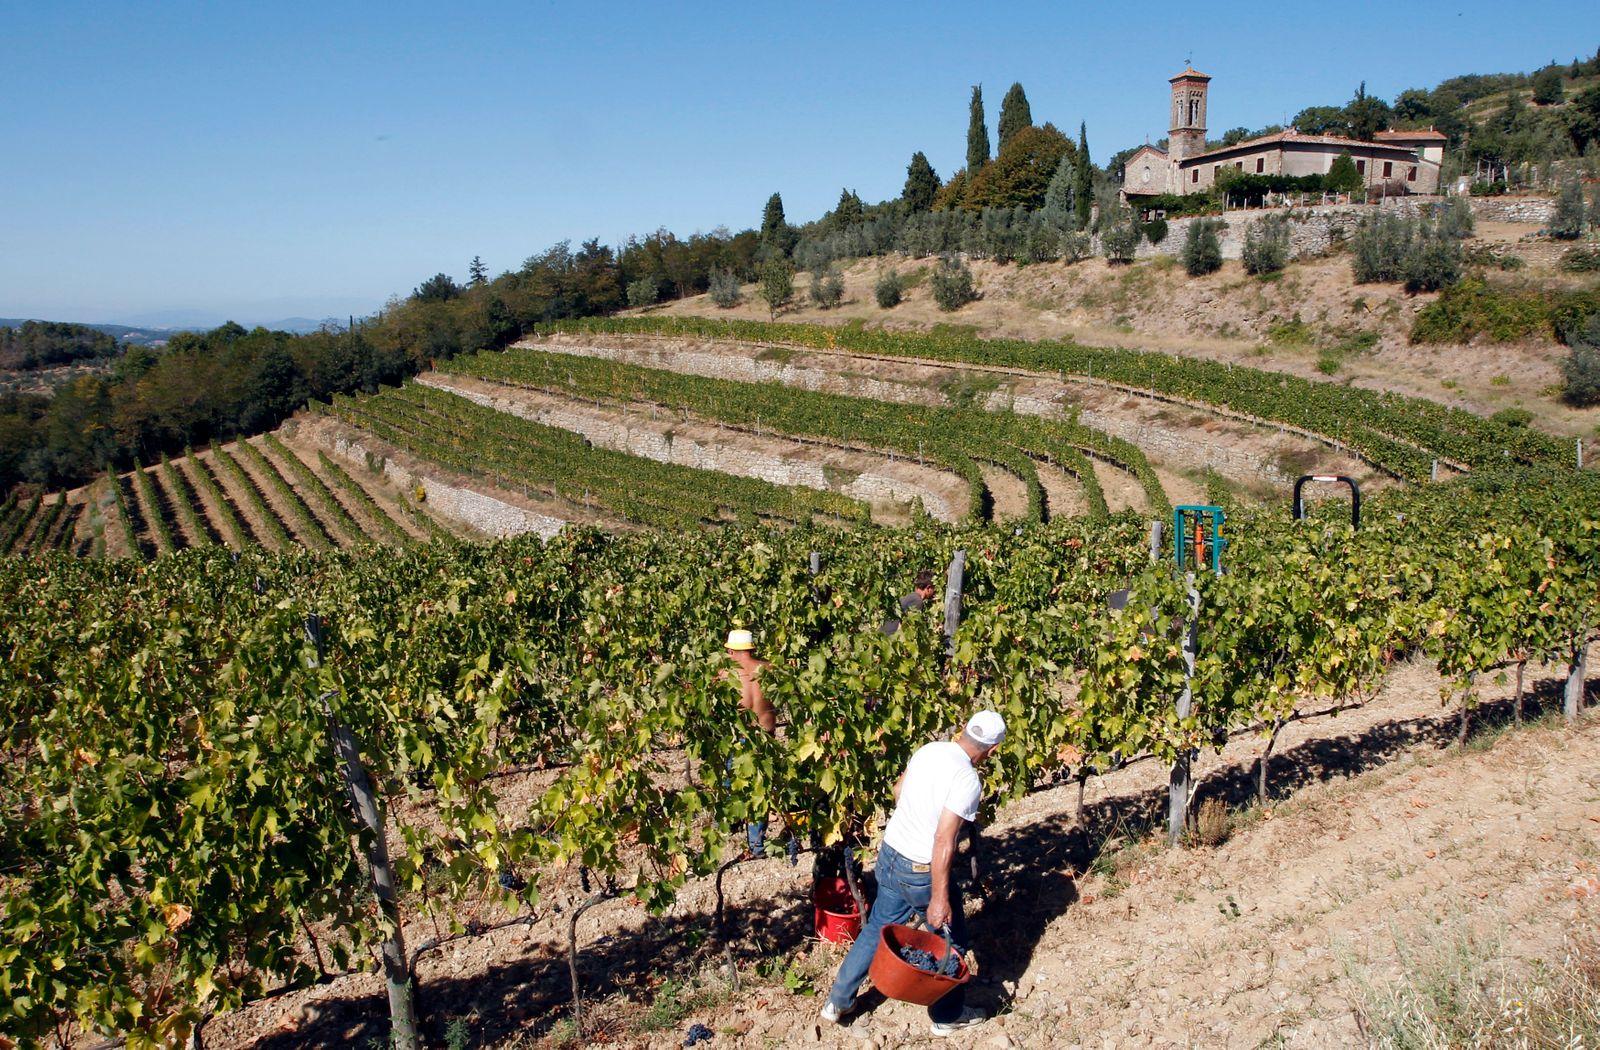 Italien / Toskana / Wein / Weinlese / Weinberg / Chianti